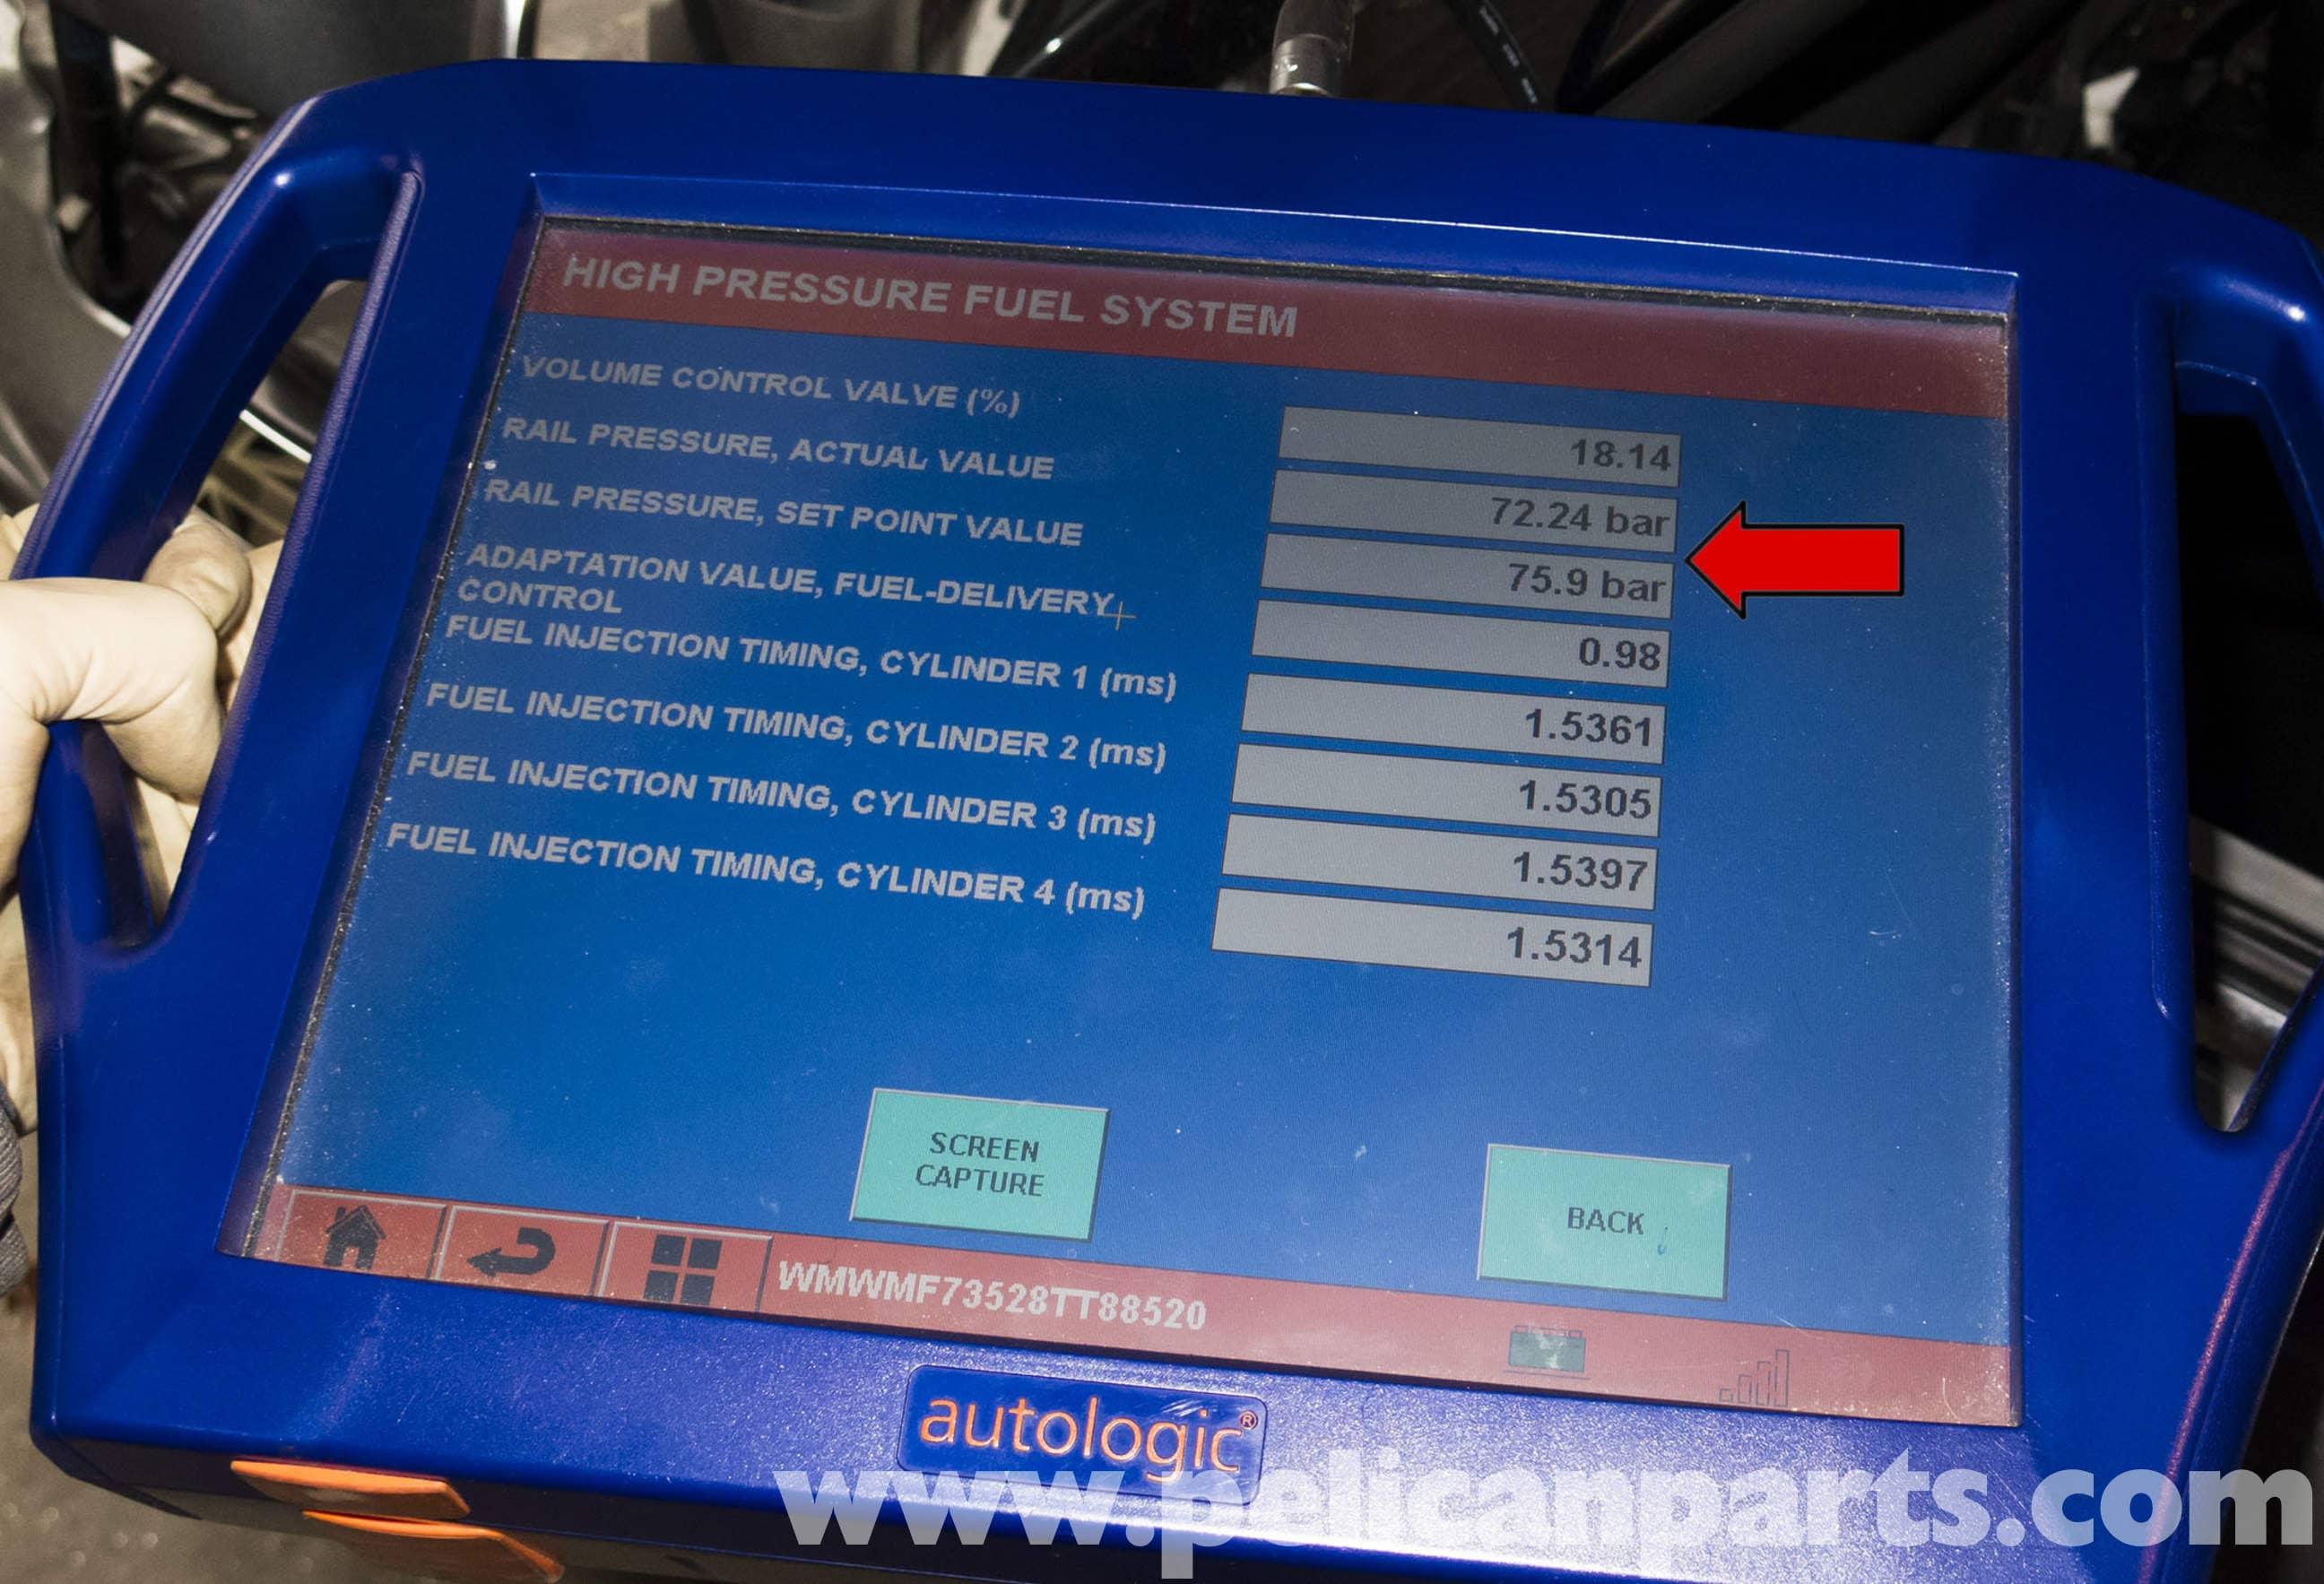 Mini Cooper R56 Fuel Pump Testing 2007 2011 Pelican Parts Diy Digital Pressure Tester Snap On Large Image Extra